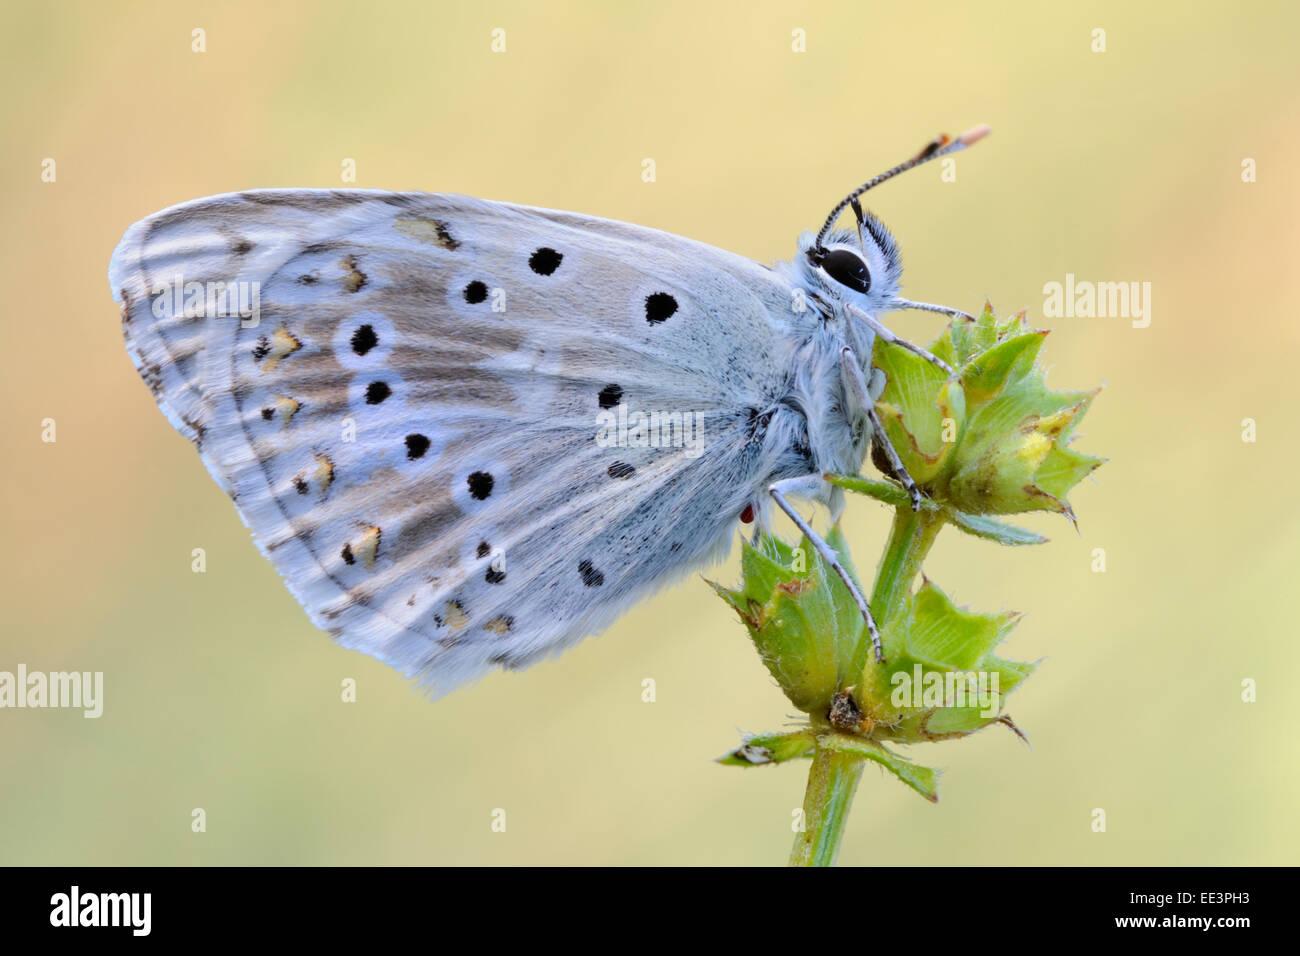 Silbergrüner Bläuling chalkhill blue [Polyommatus coridon] [butterfly] - Stock Image